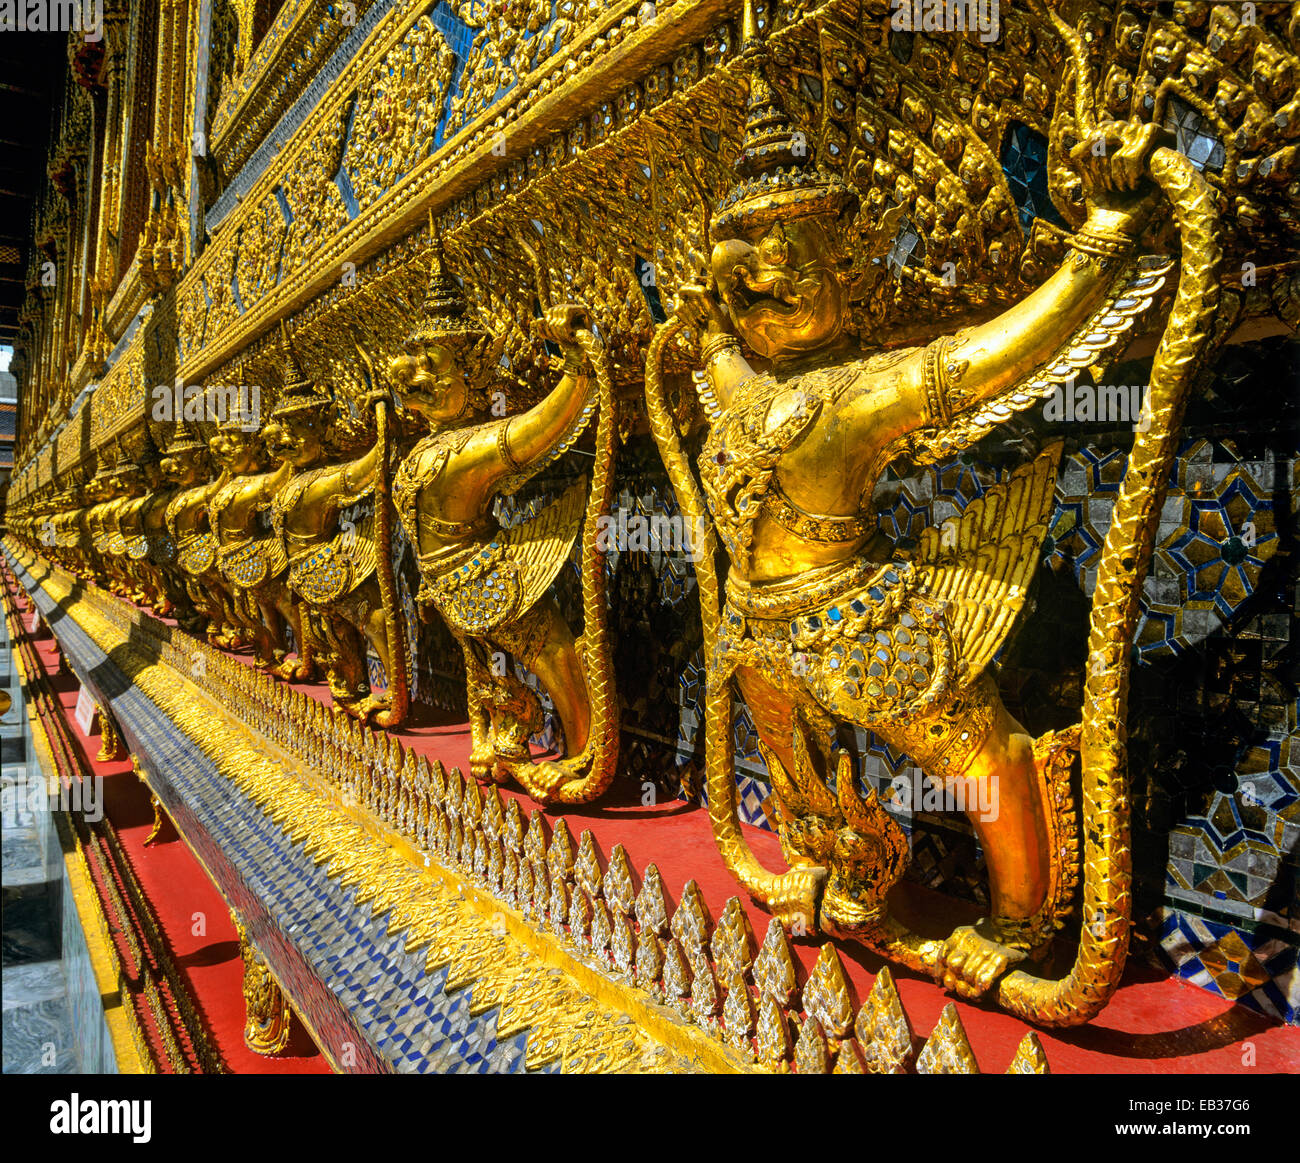 Gilded Garudas, mythical bird-like creatures, Wat Phra Kaeo Temple, Royal Palace, Bangkok, Central Thailand, Thailand - Stock Image